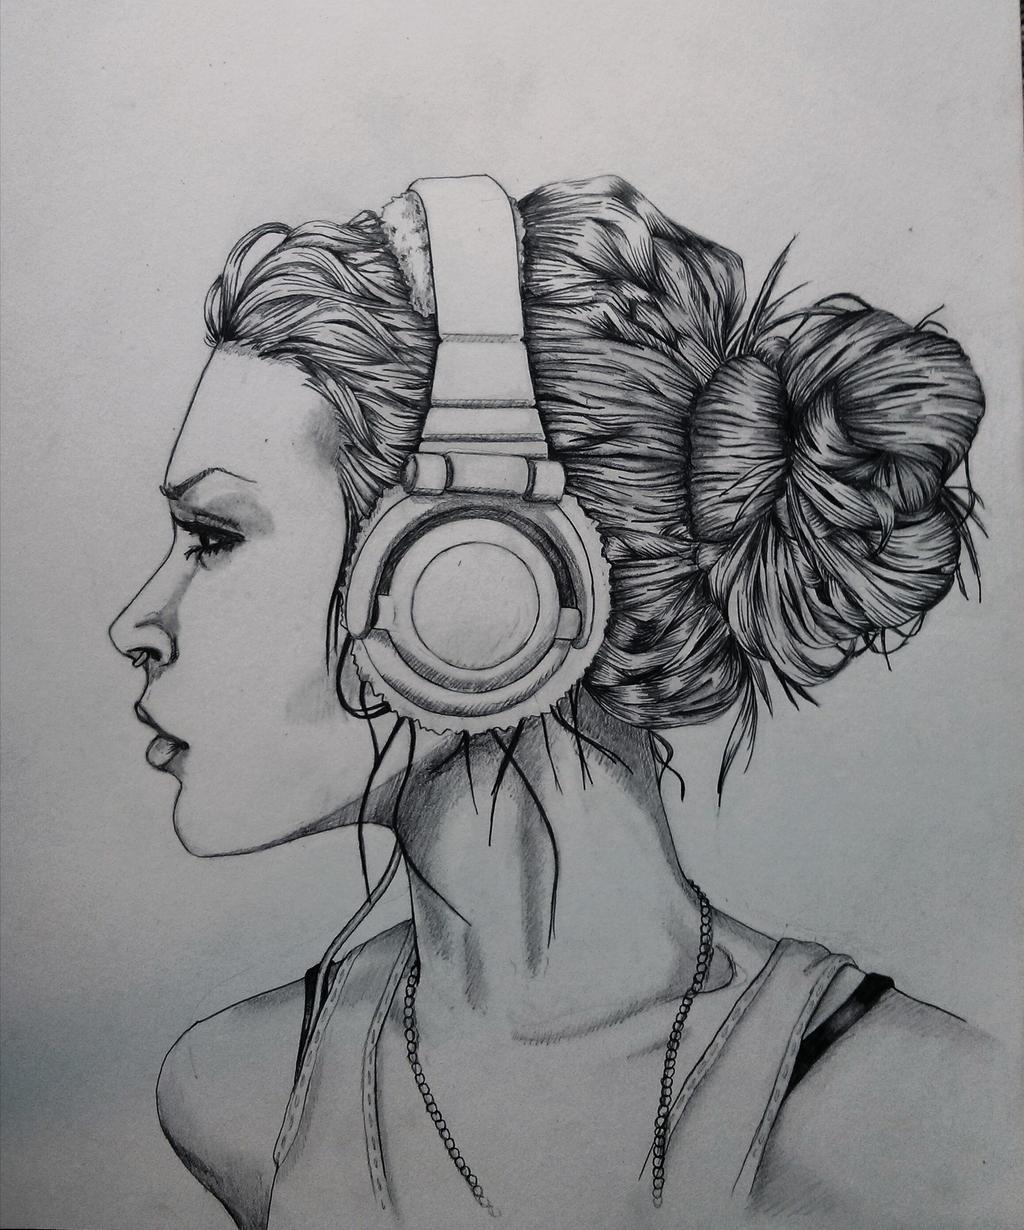 Headphones by workingfire